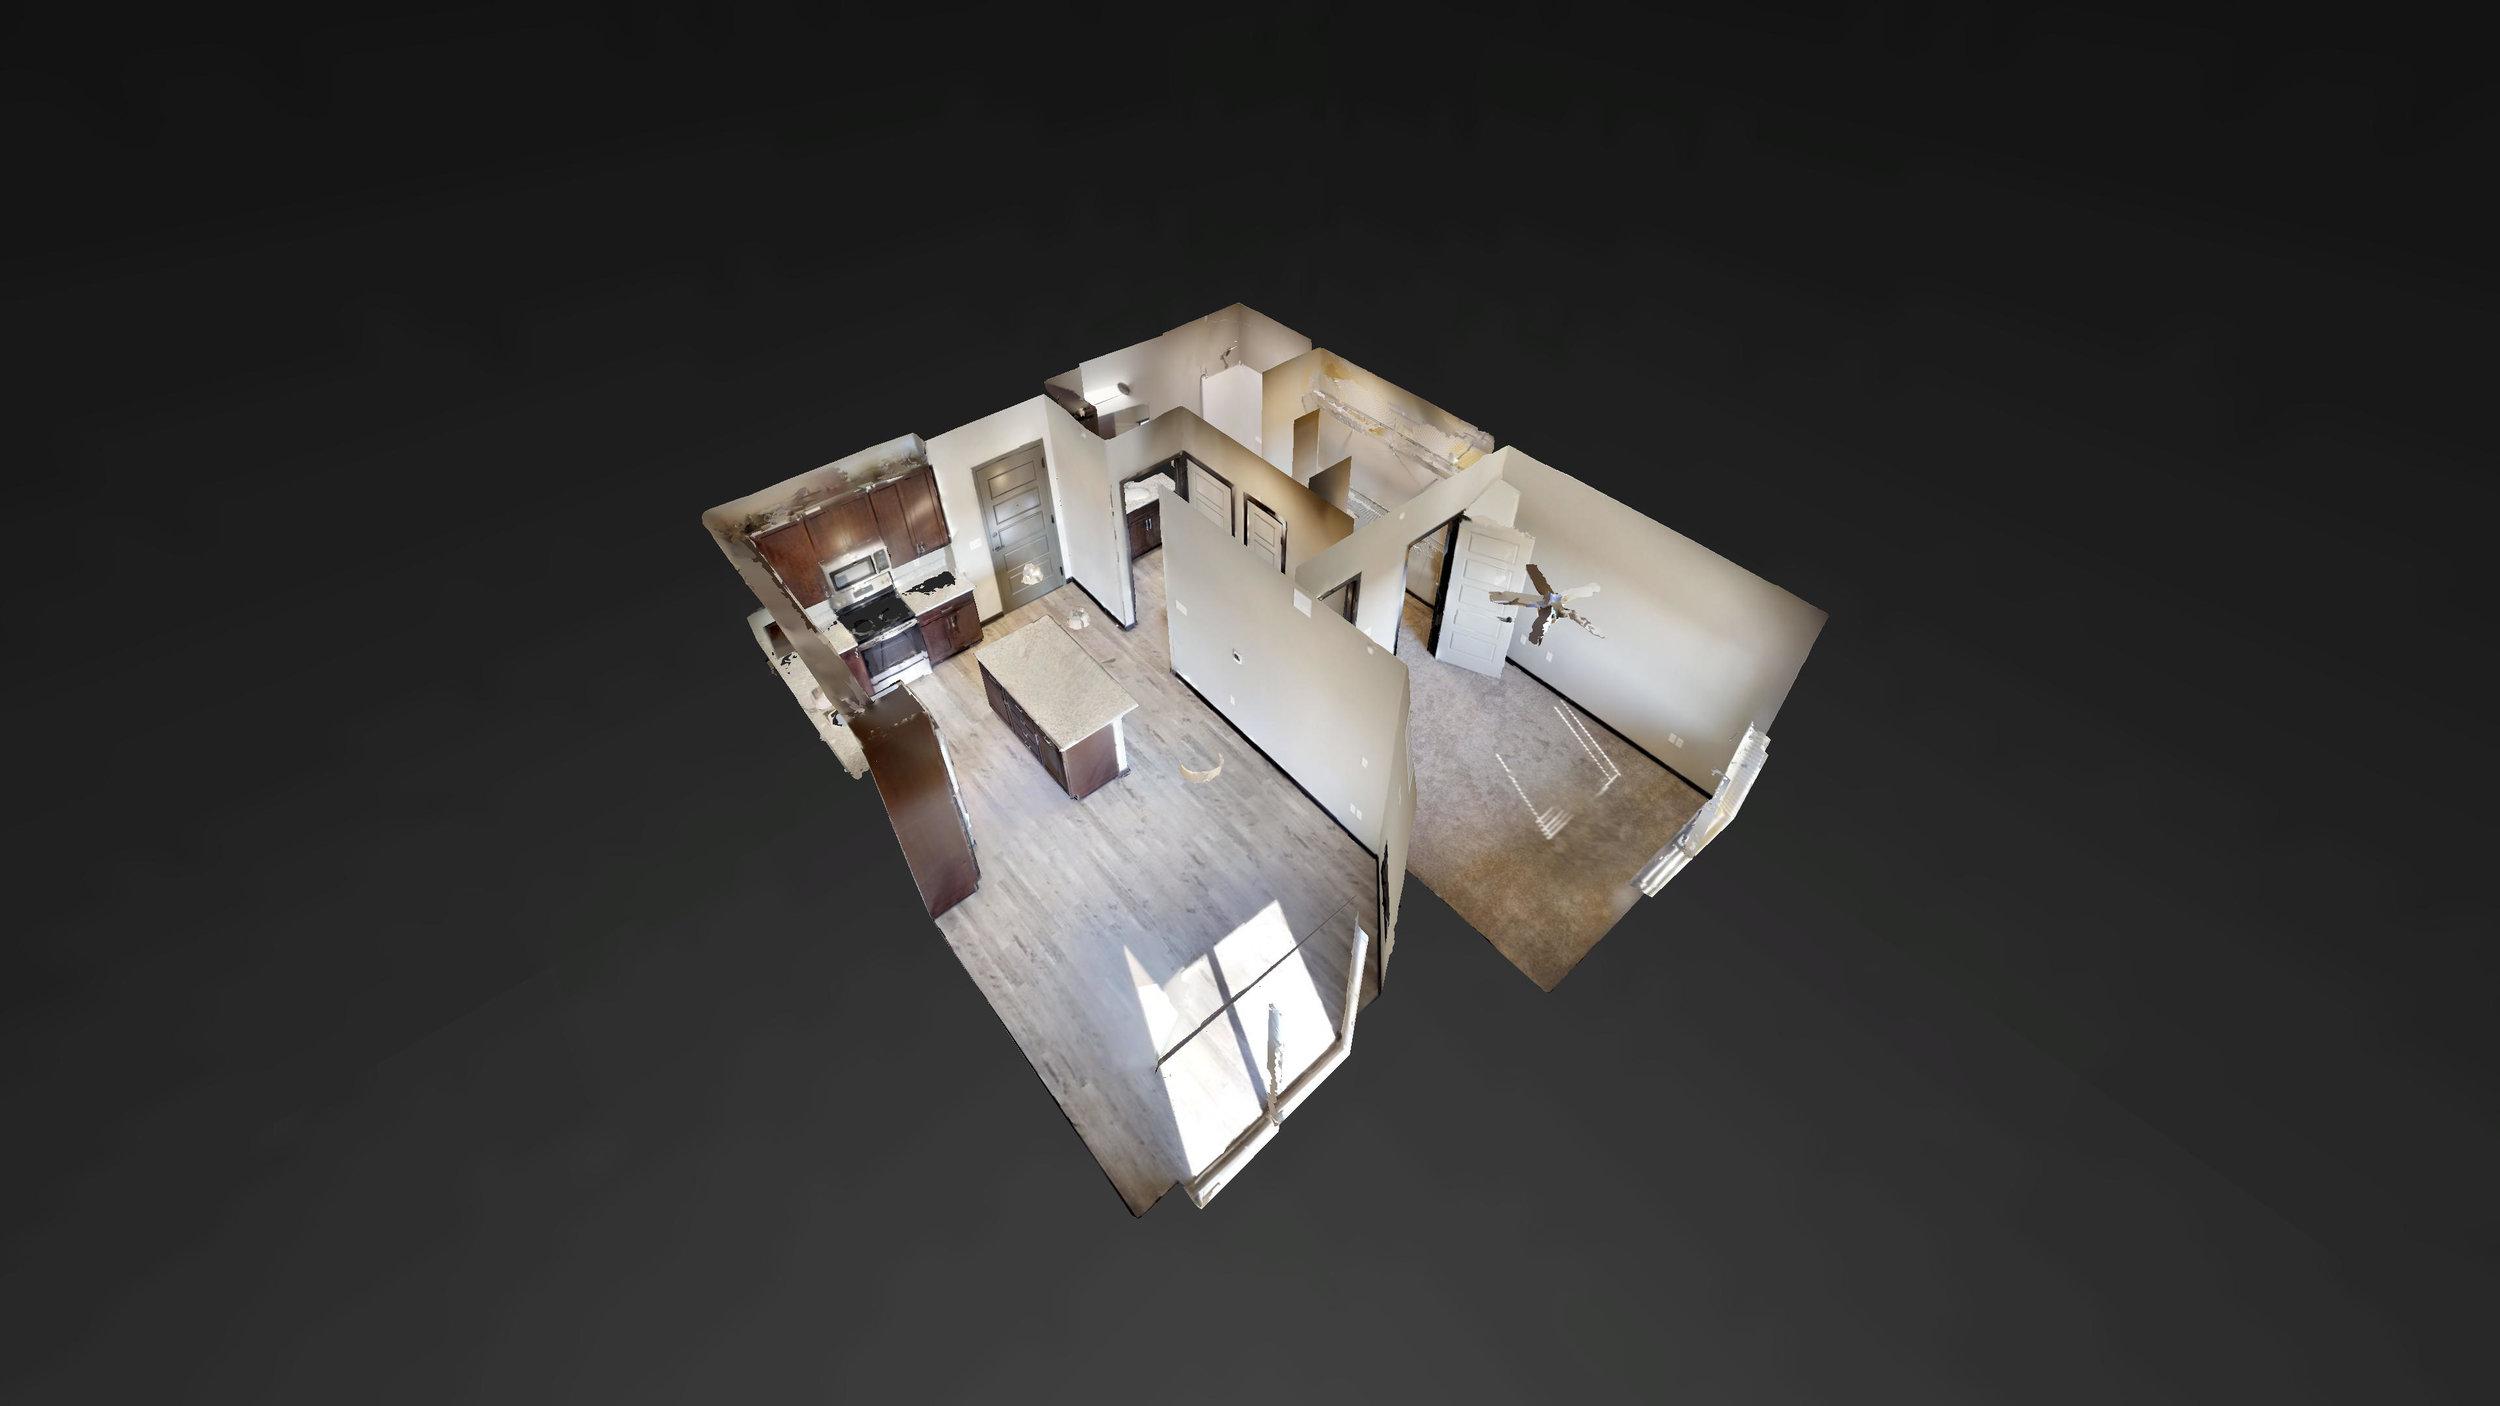 1-Bedroom-Model-10022018_155606.jpg